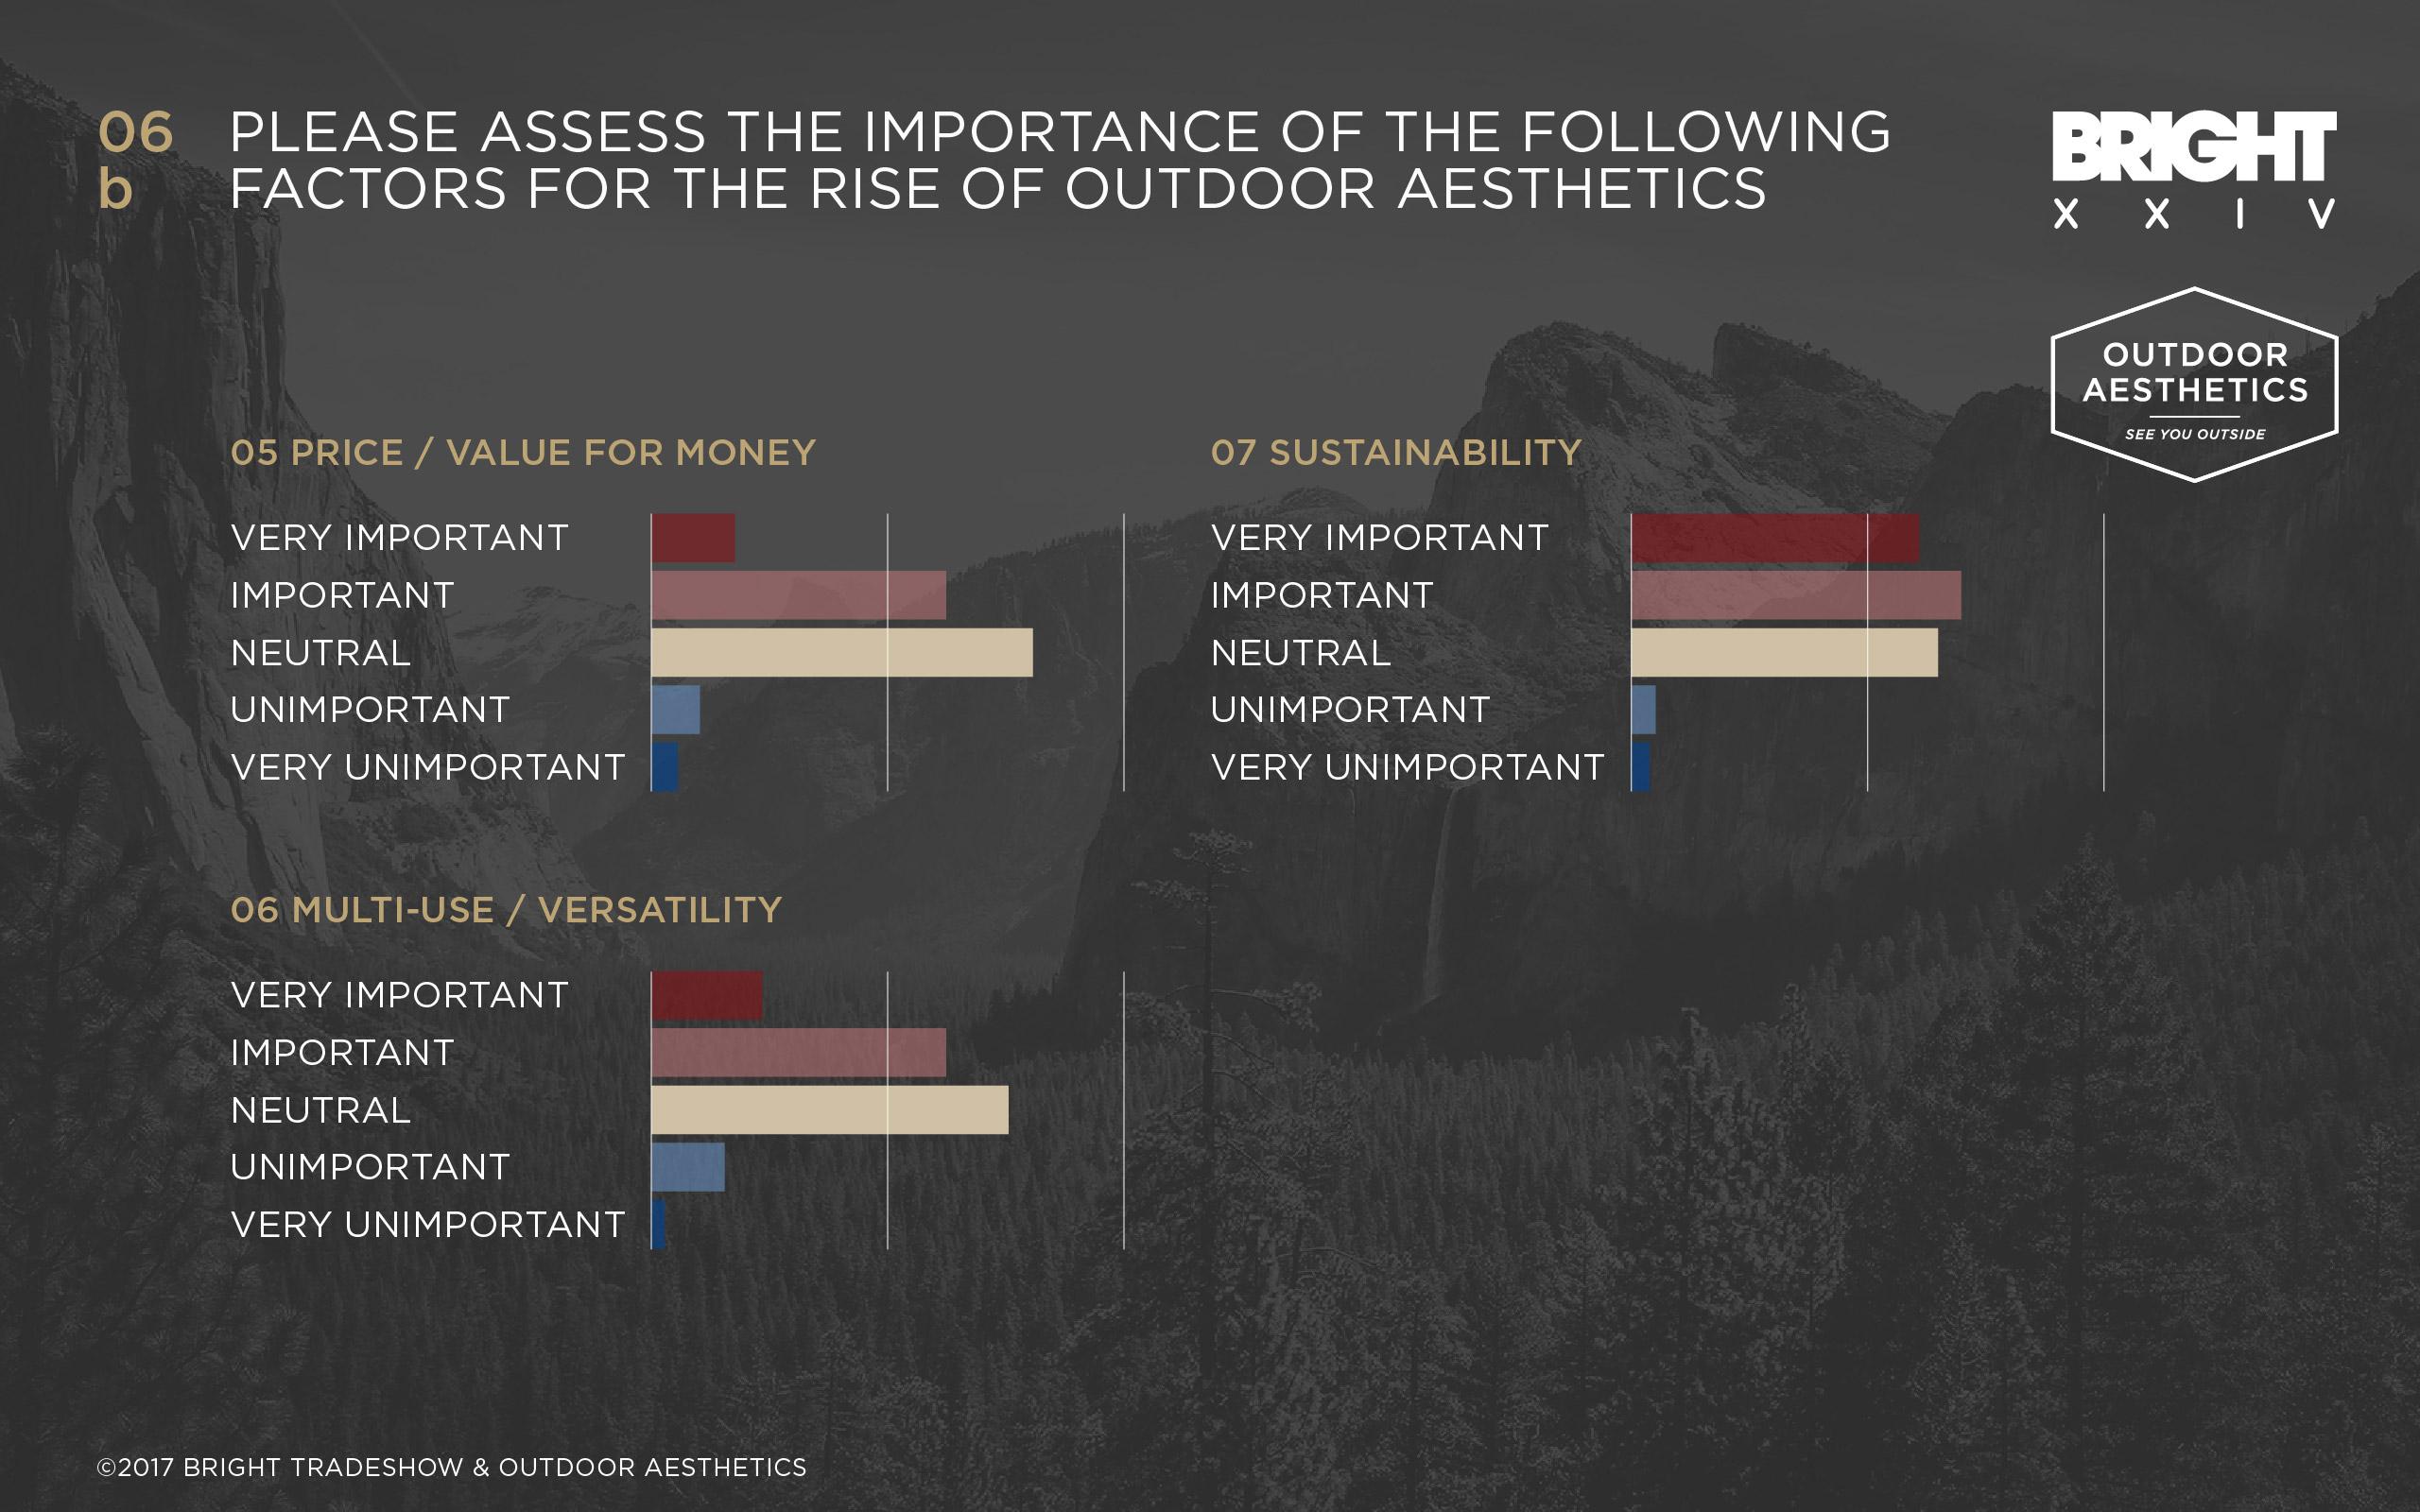 outdoor-aesthetics-trend-survey-2017-08